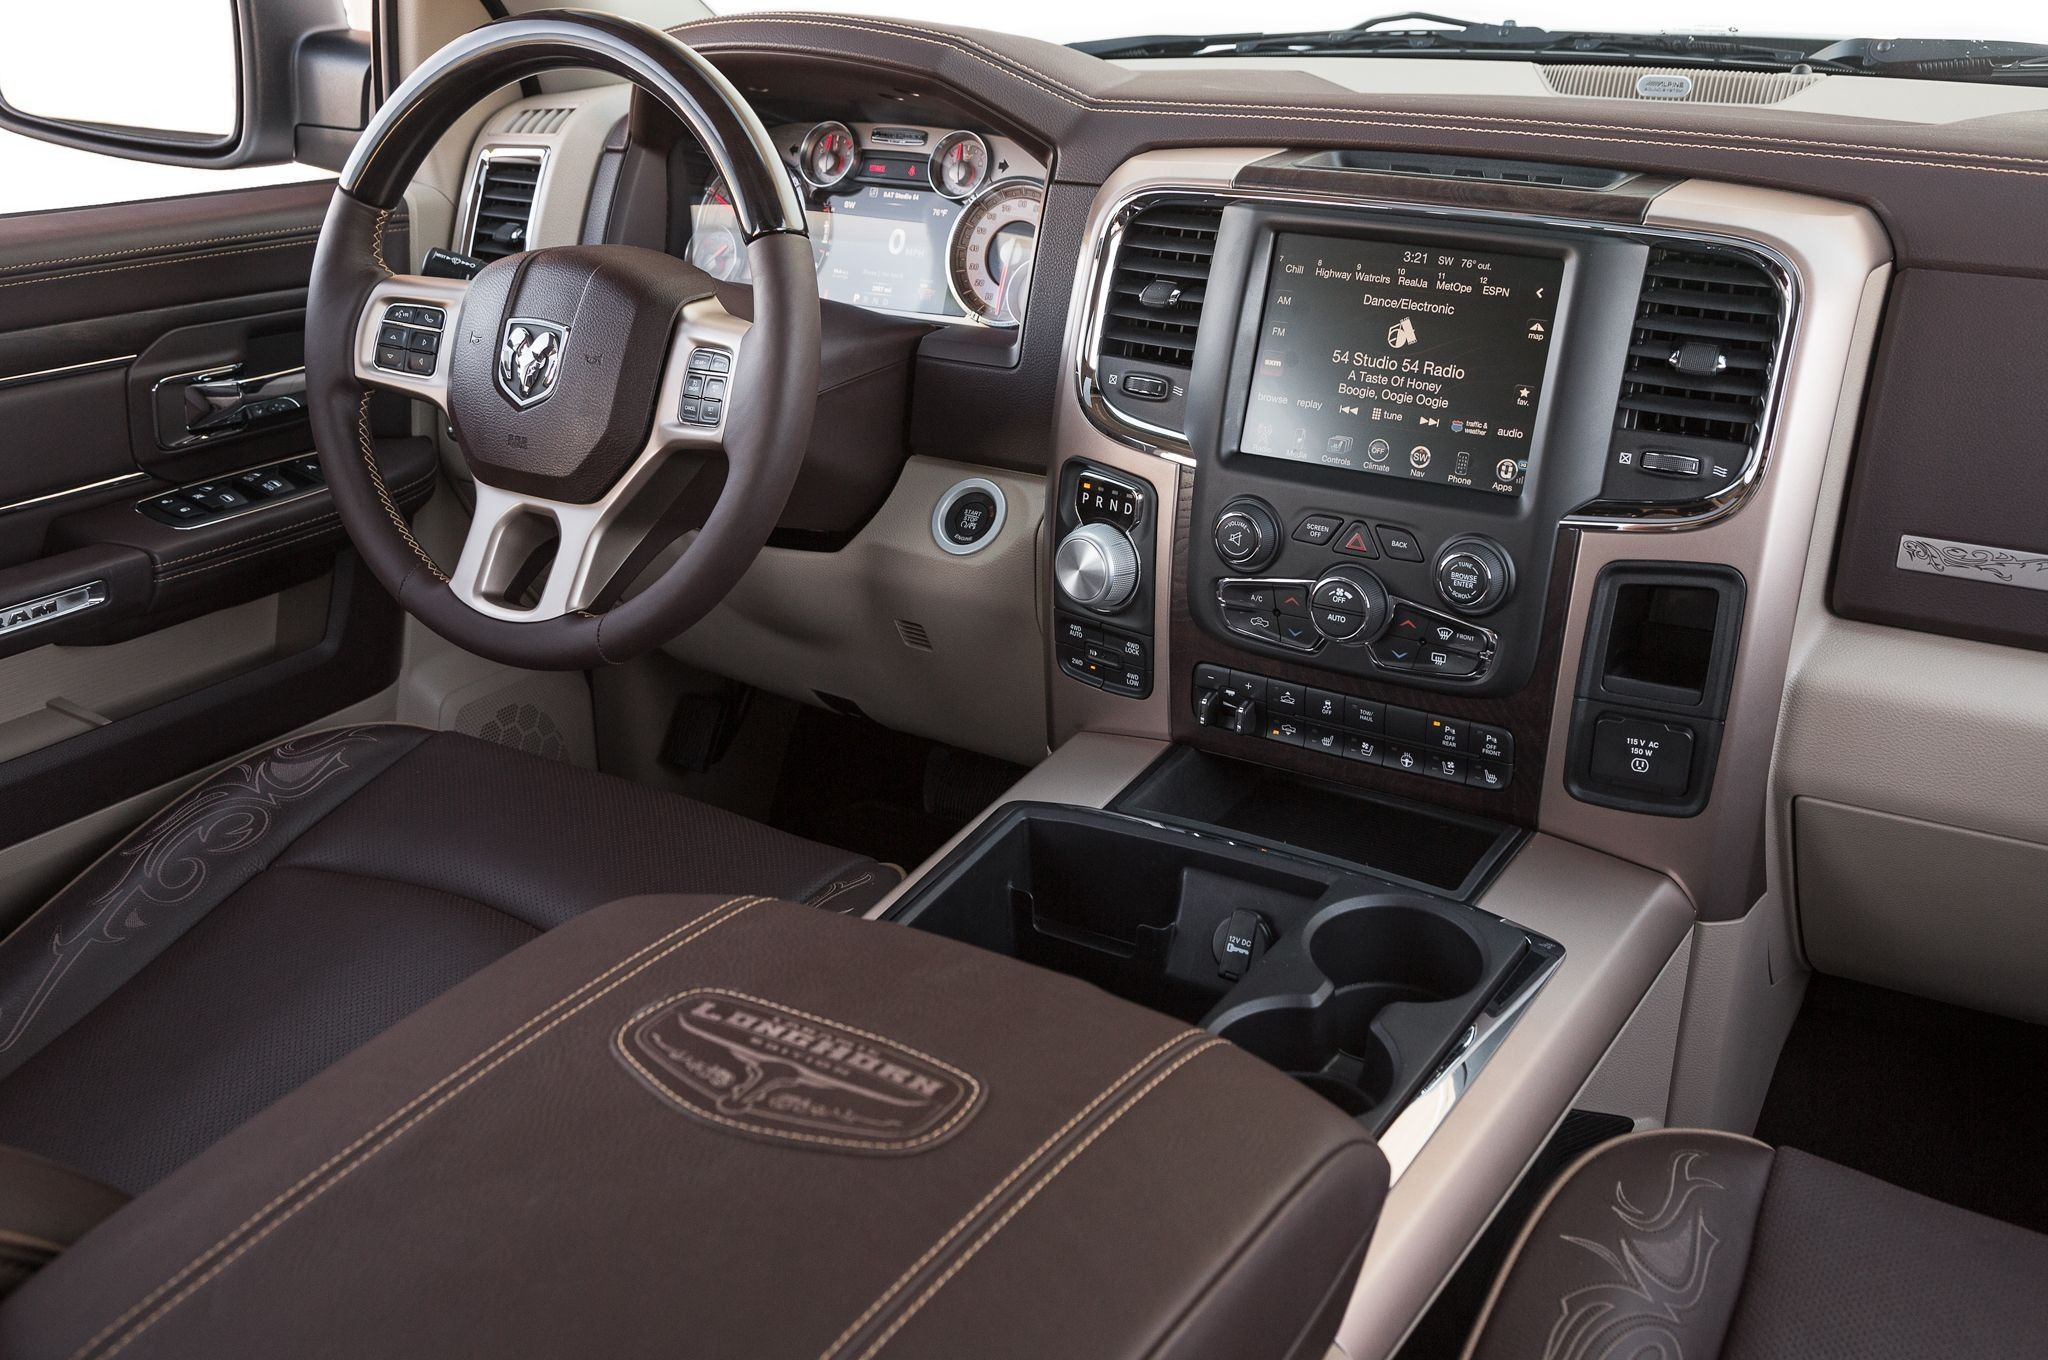 2019 Dodge Ram Ecodiesel Interior Exterior And Review Dodge Ram Dodge Chevy Diesel Trucks